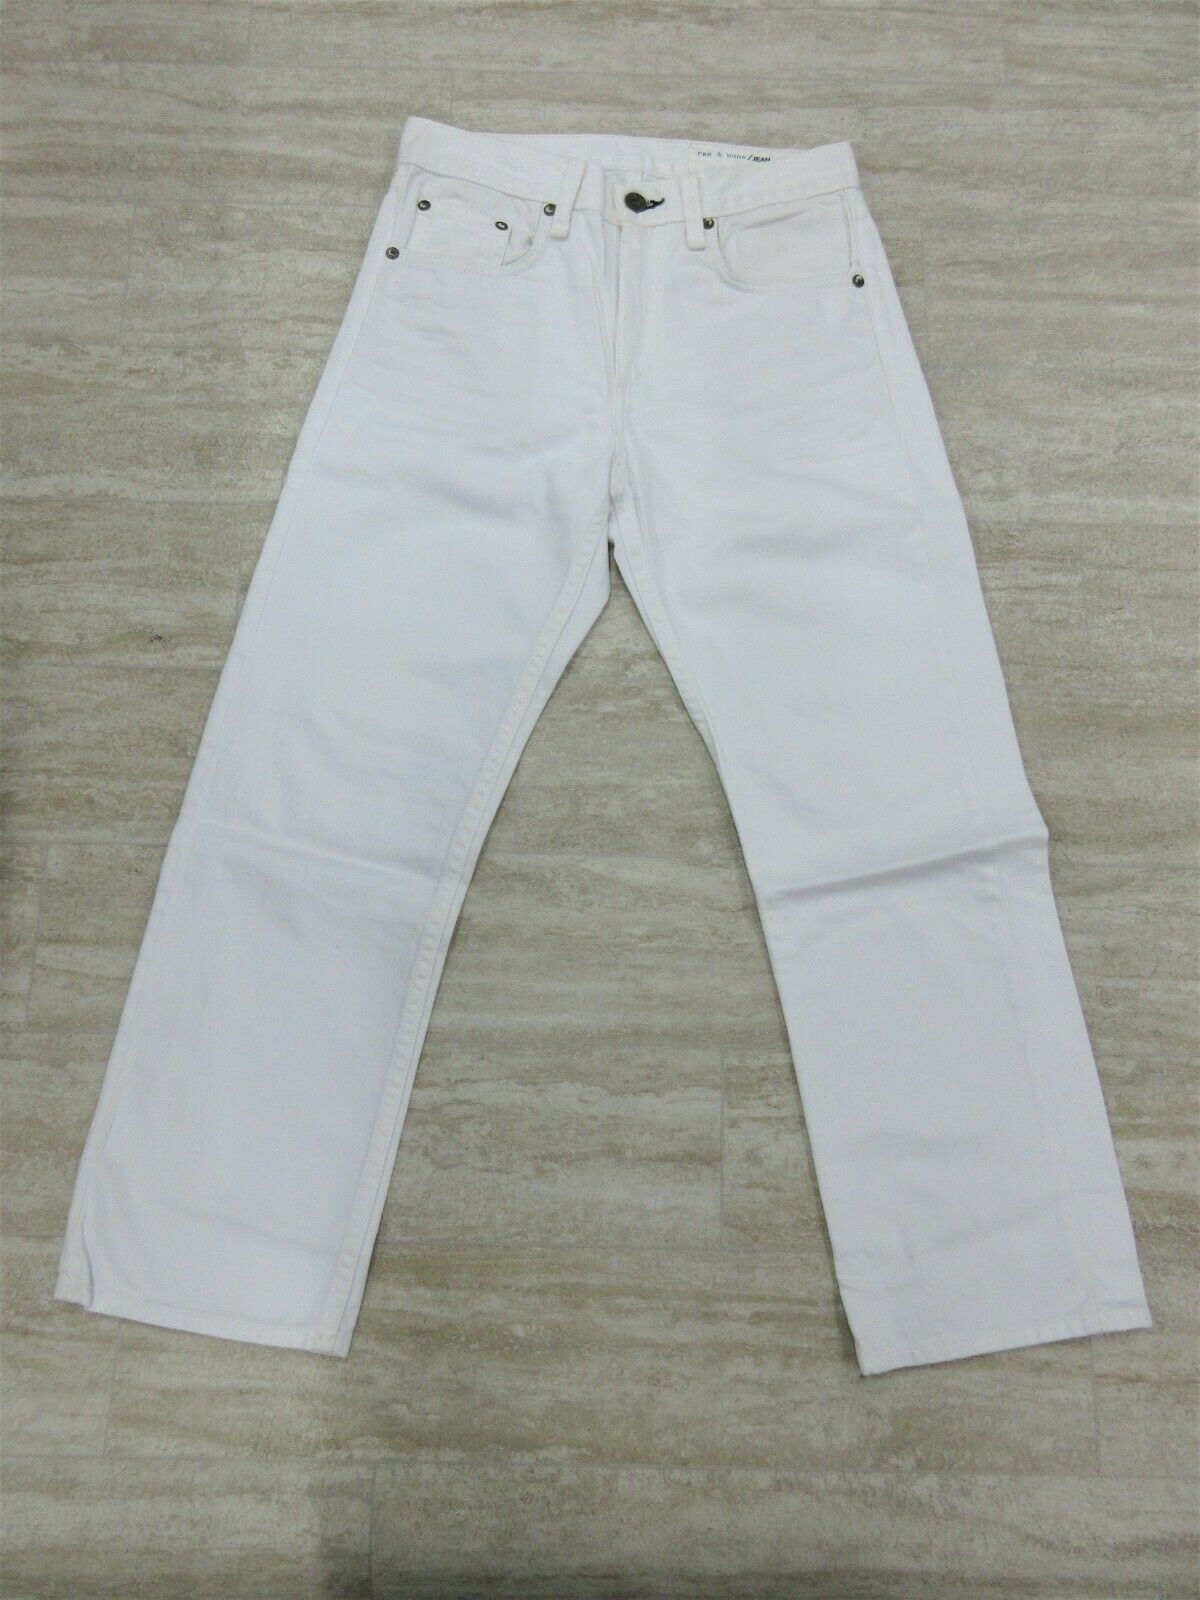 New Rag & Bone   Jeans Marilyn Crop Jean color  White Nolita Size  25 -D